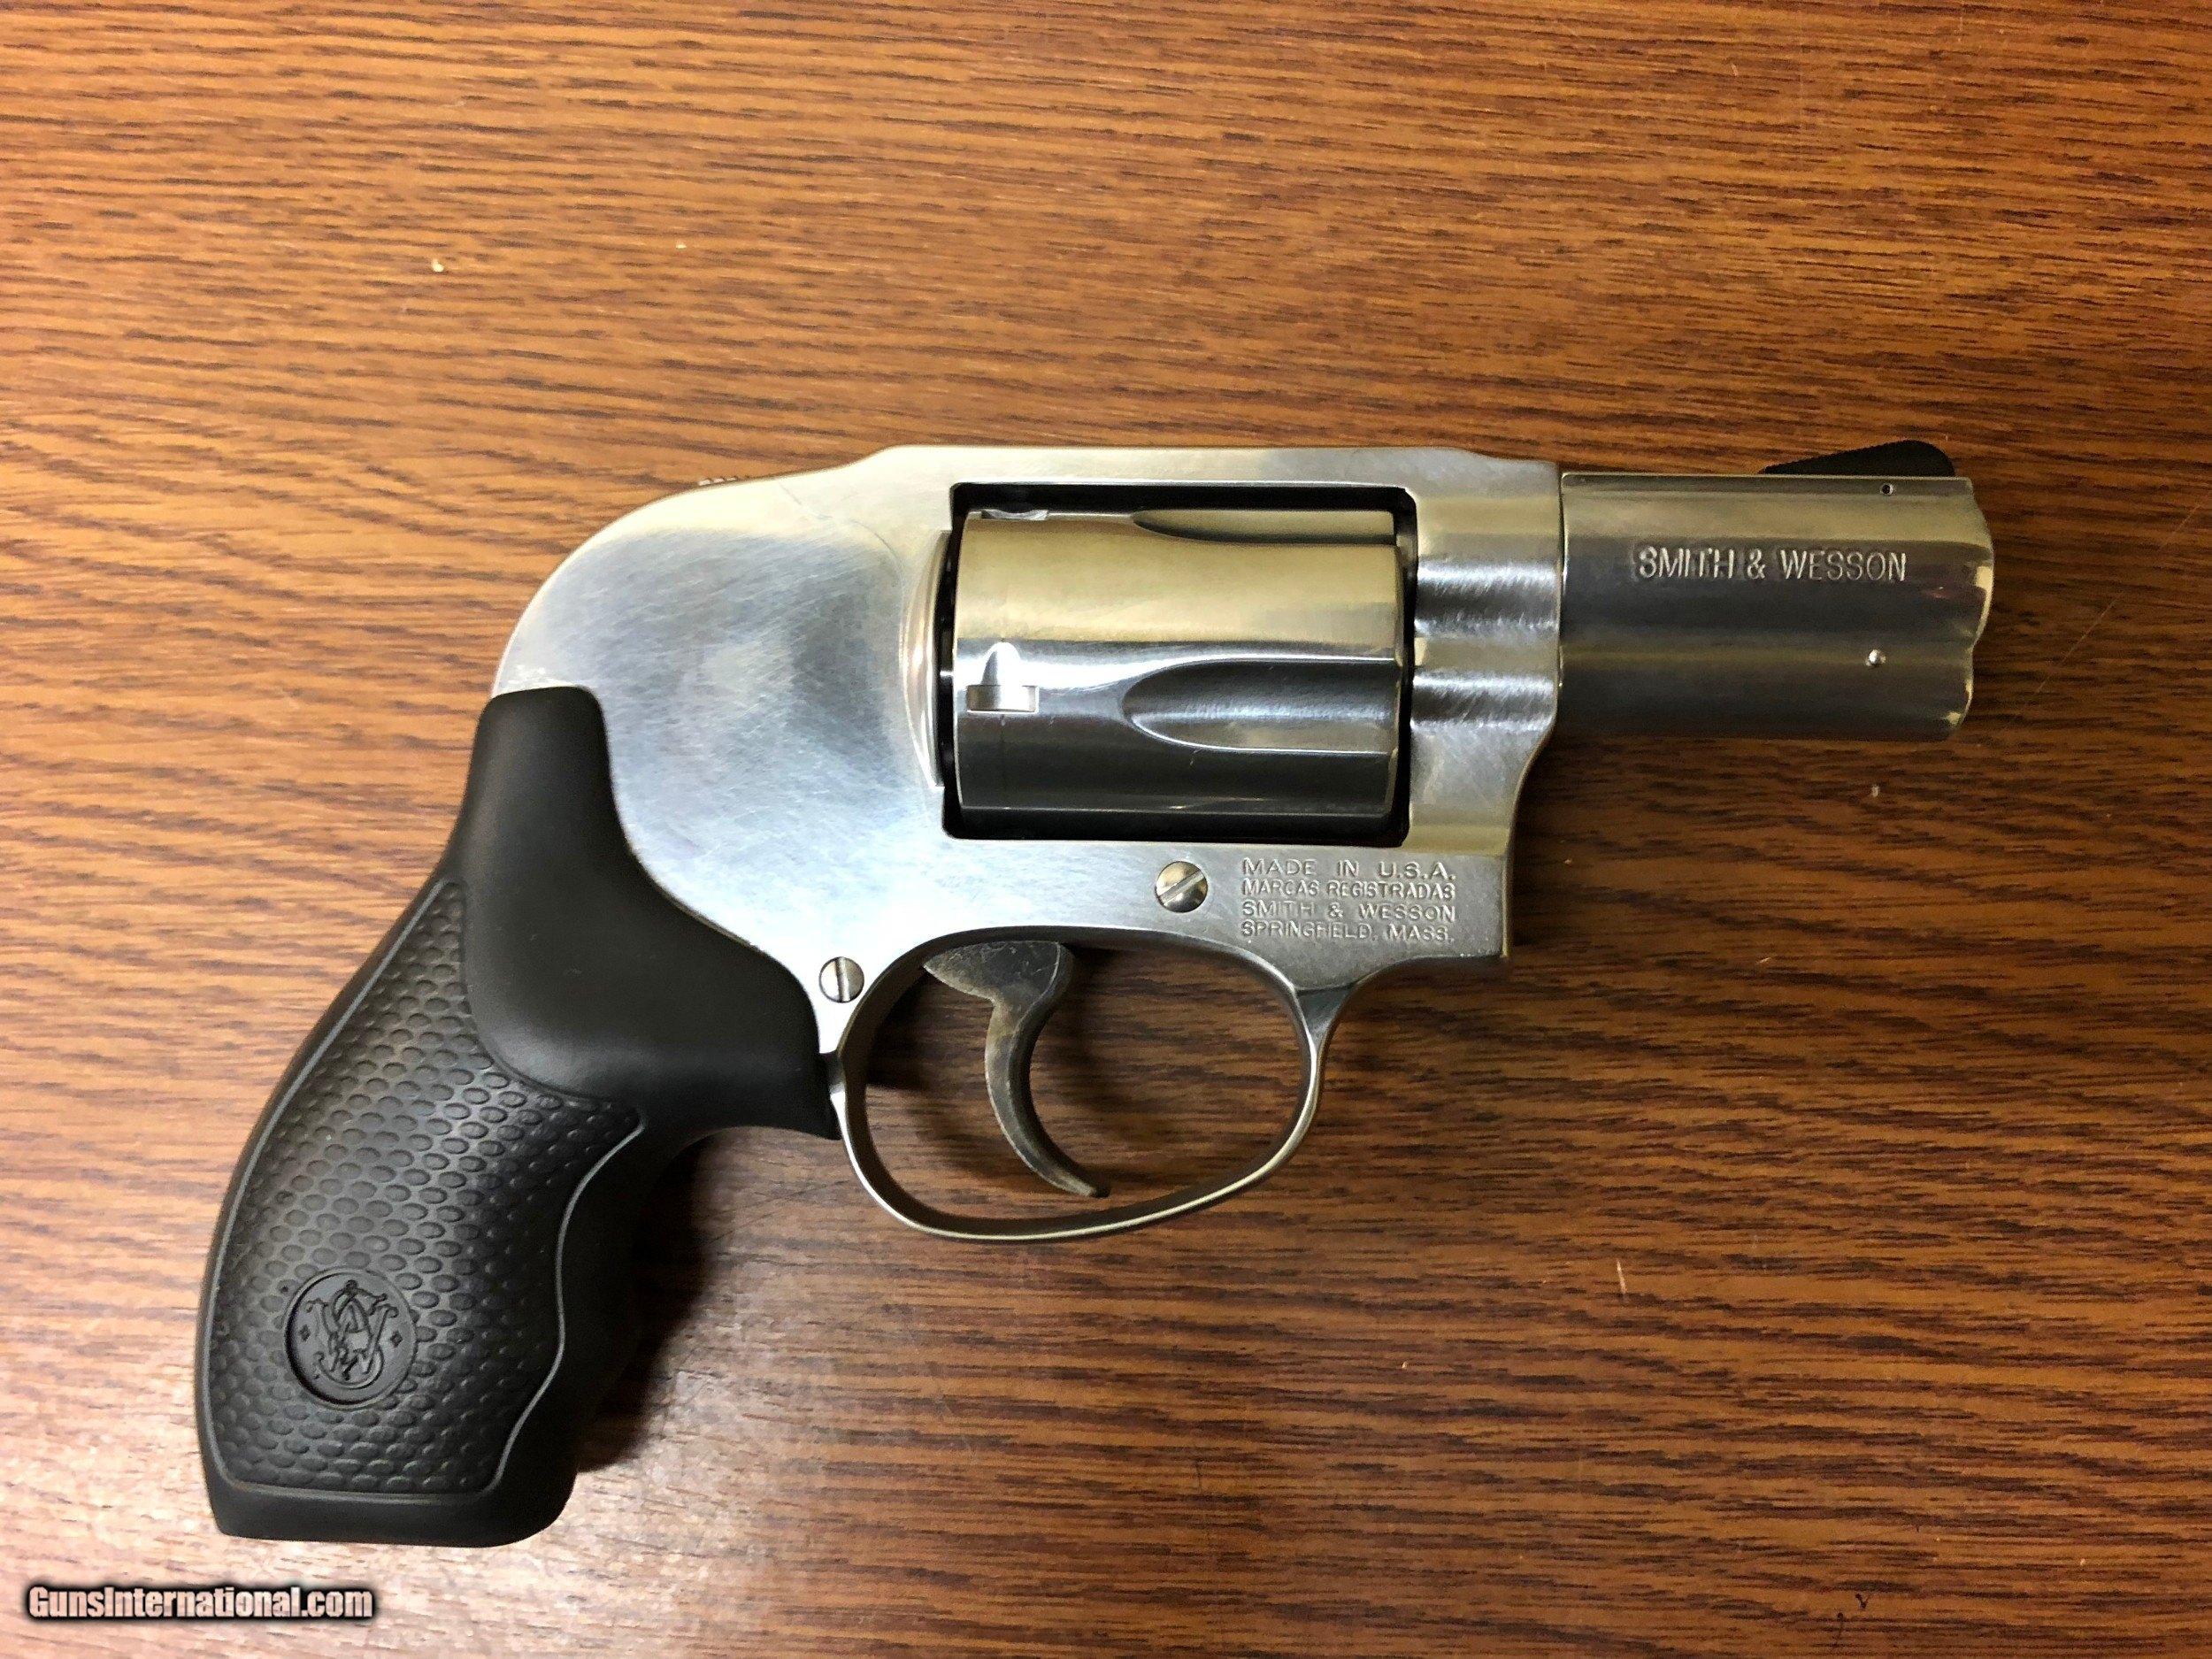 Smith & Wesson 649 Revolver 163210, 357 Magnum